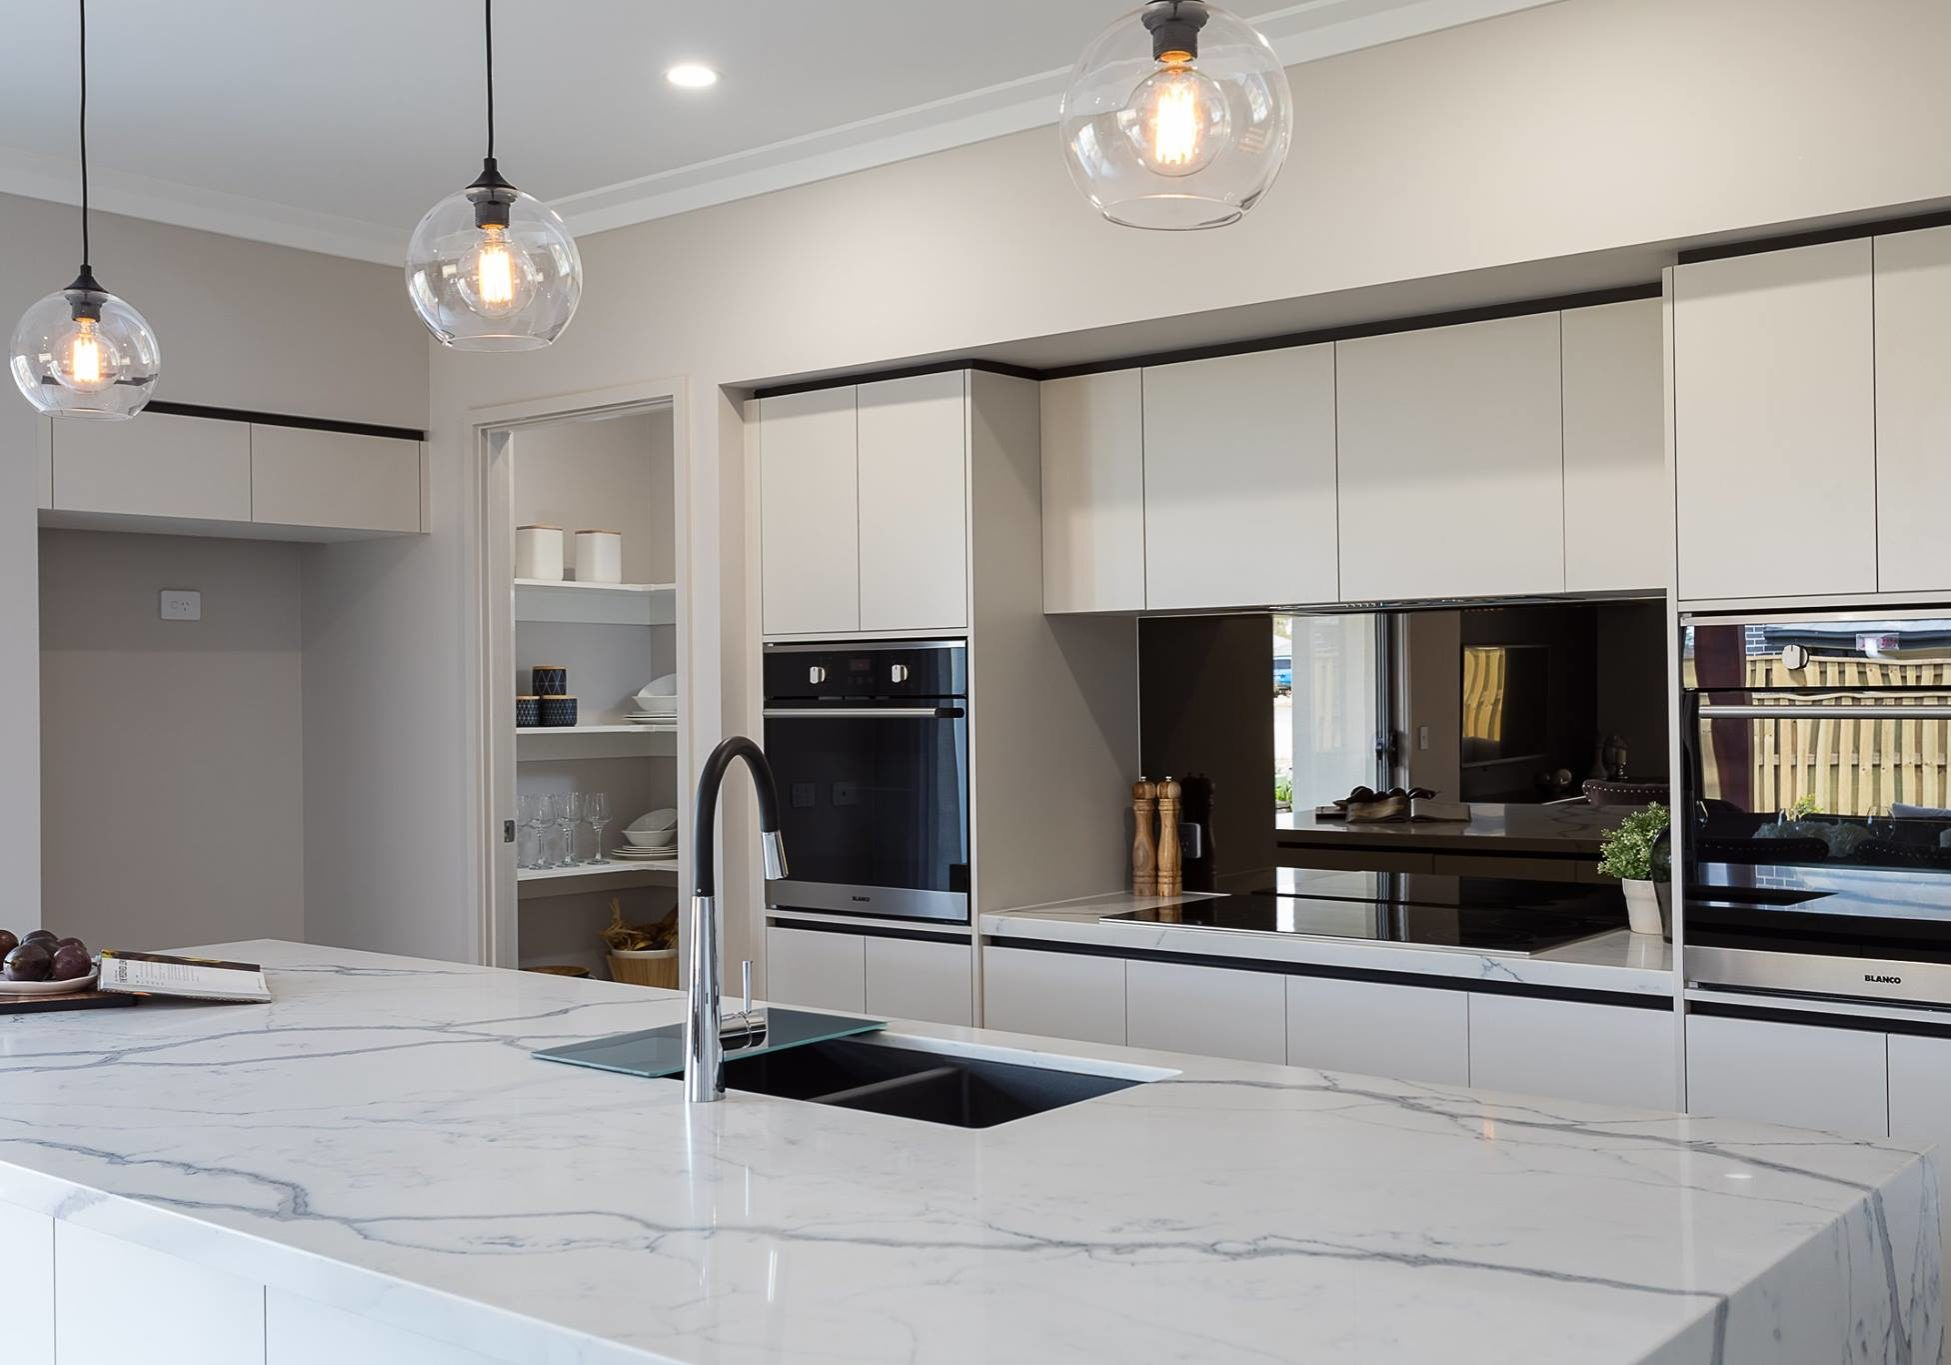 Quality kitchen renovation